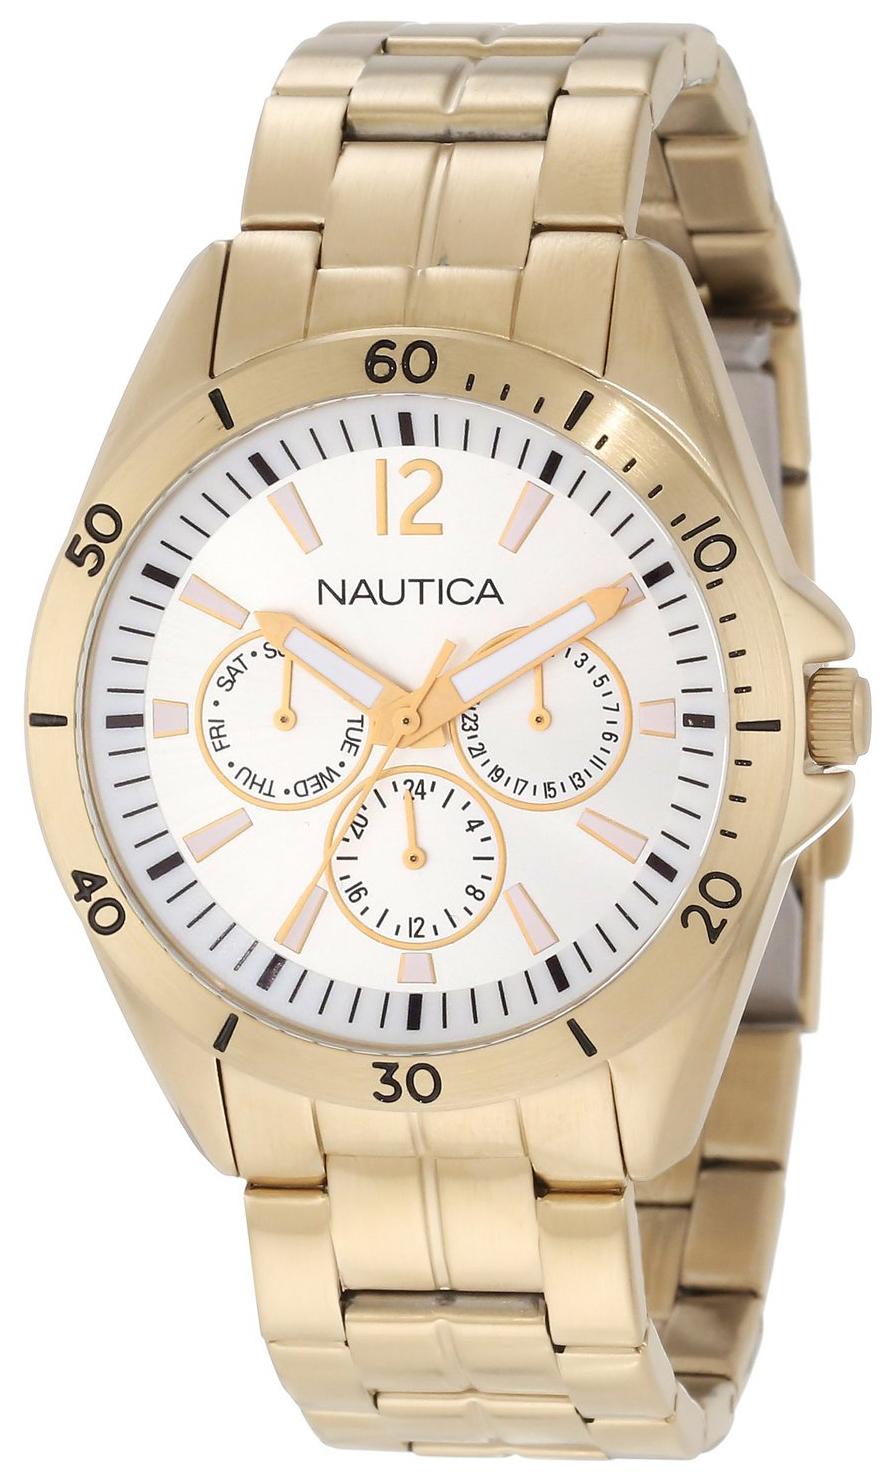 Nautica NAC Herrklocka N14637G Silverfärgad/Gulguldtonat stål Ø40 mm - Nautica